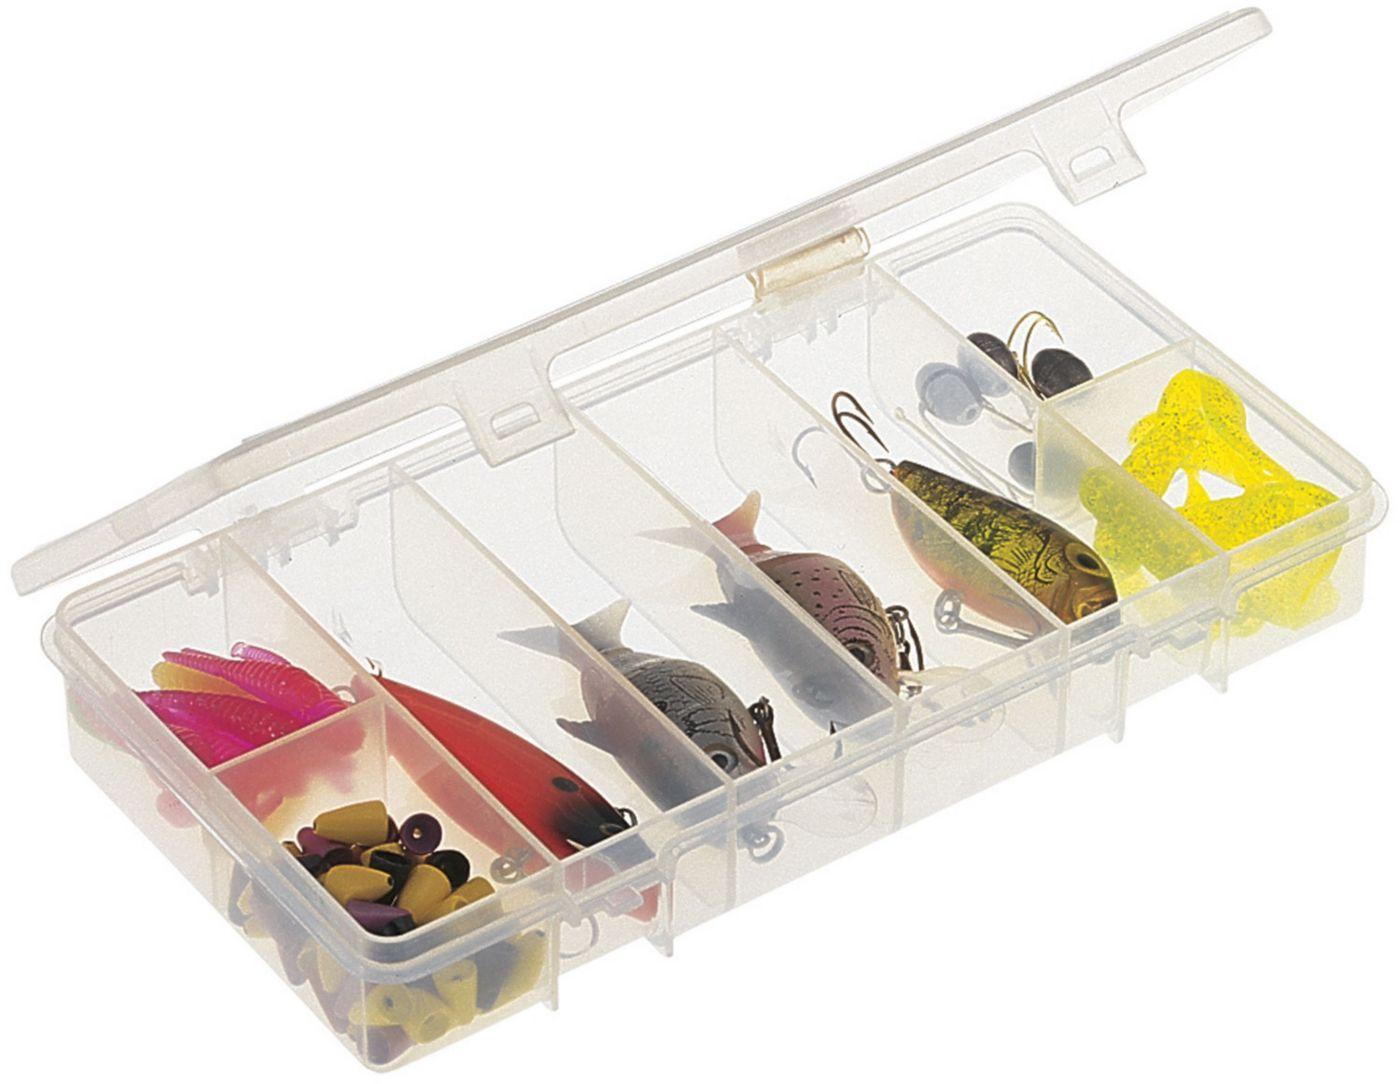 Plano 3450-28 Eight Compartment Pocket StowAway Utility Box